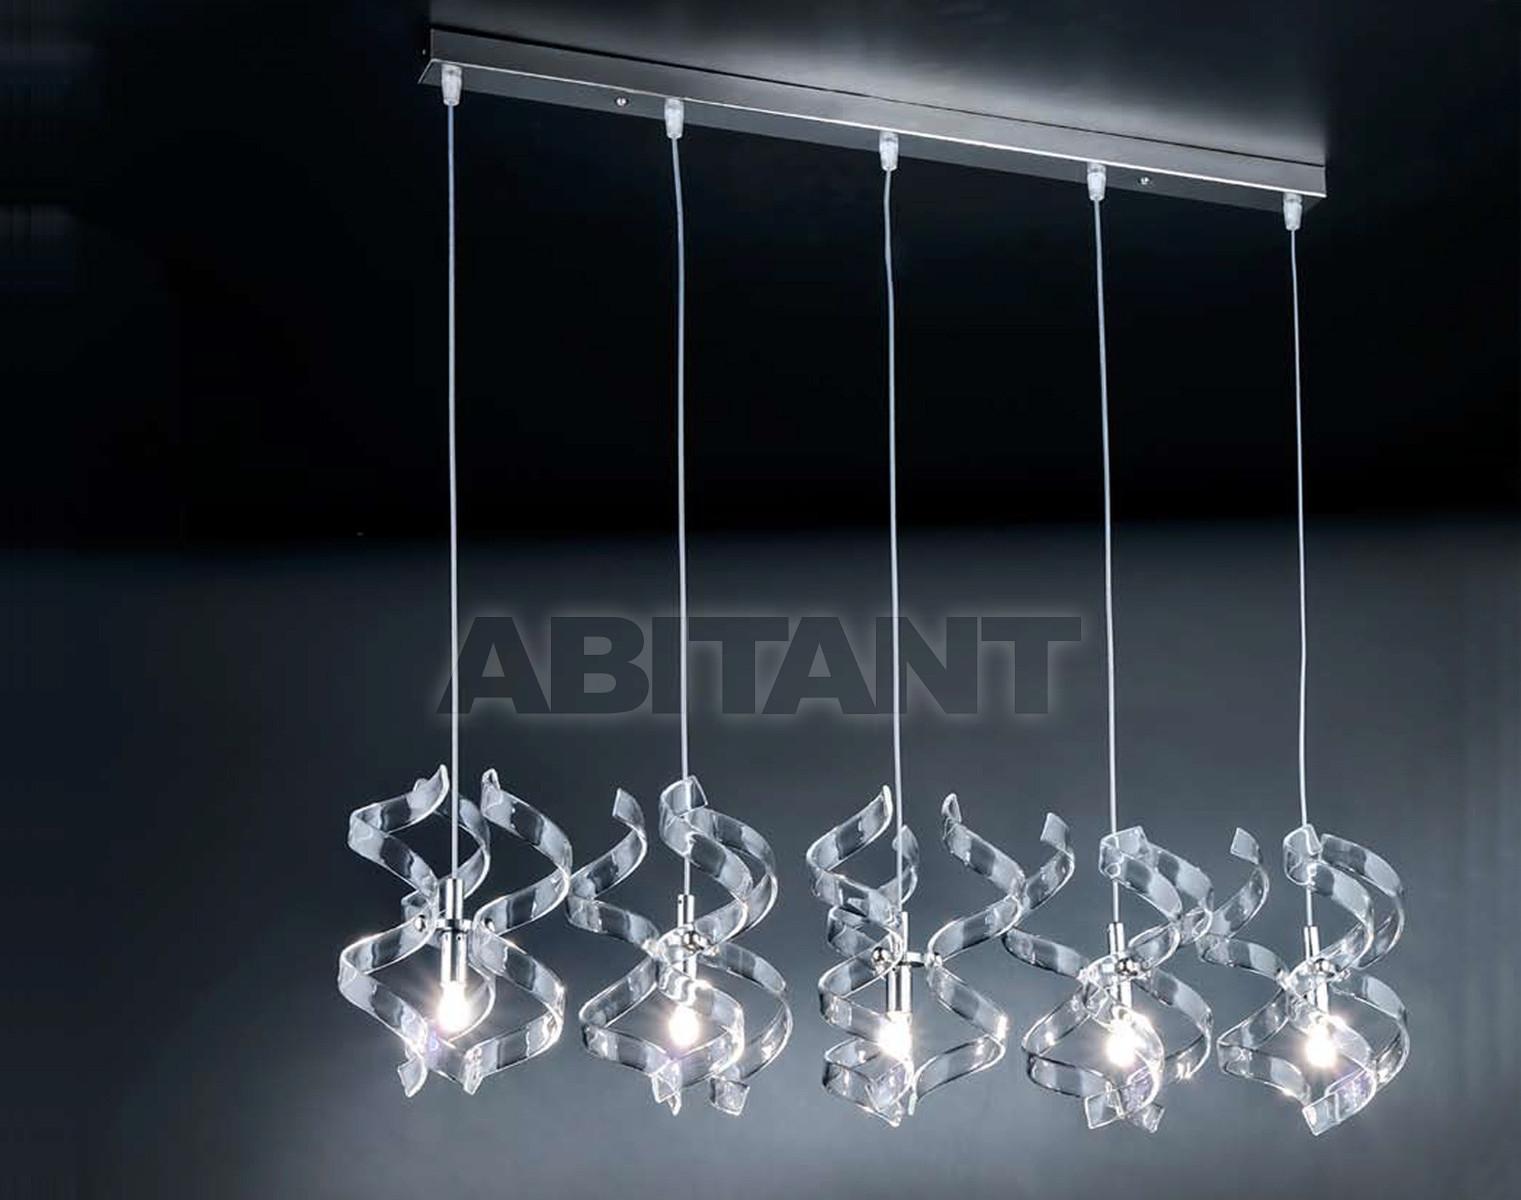 Купить Светильник Metal Lux Astro Collection 2011 206.505.01